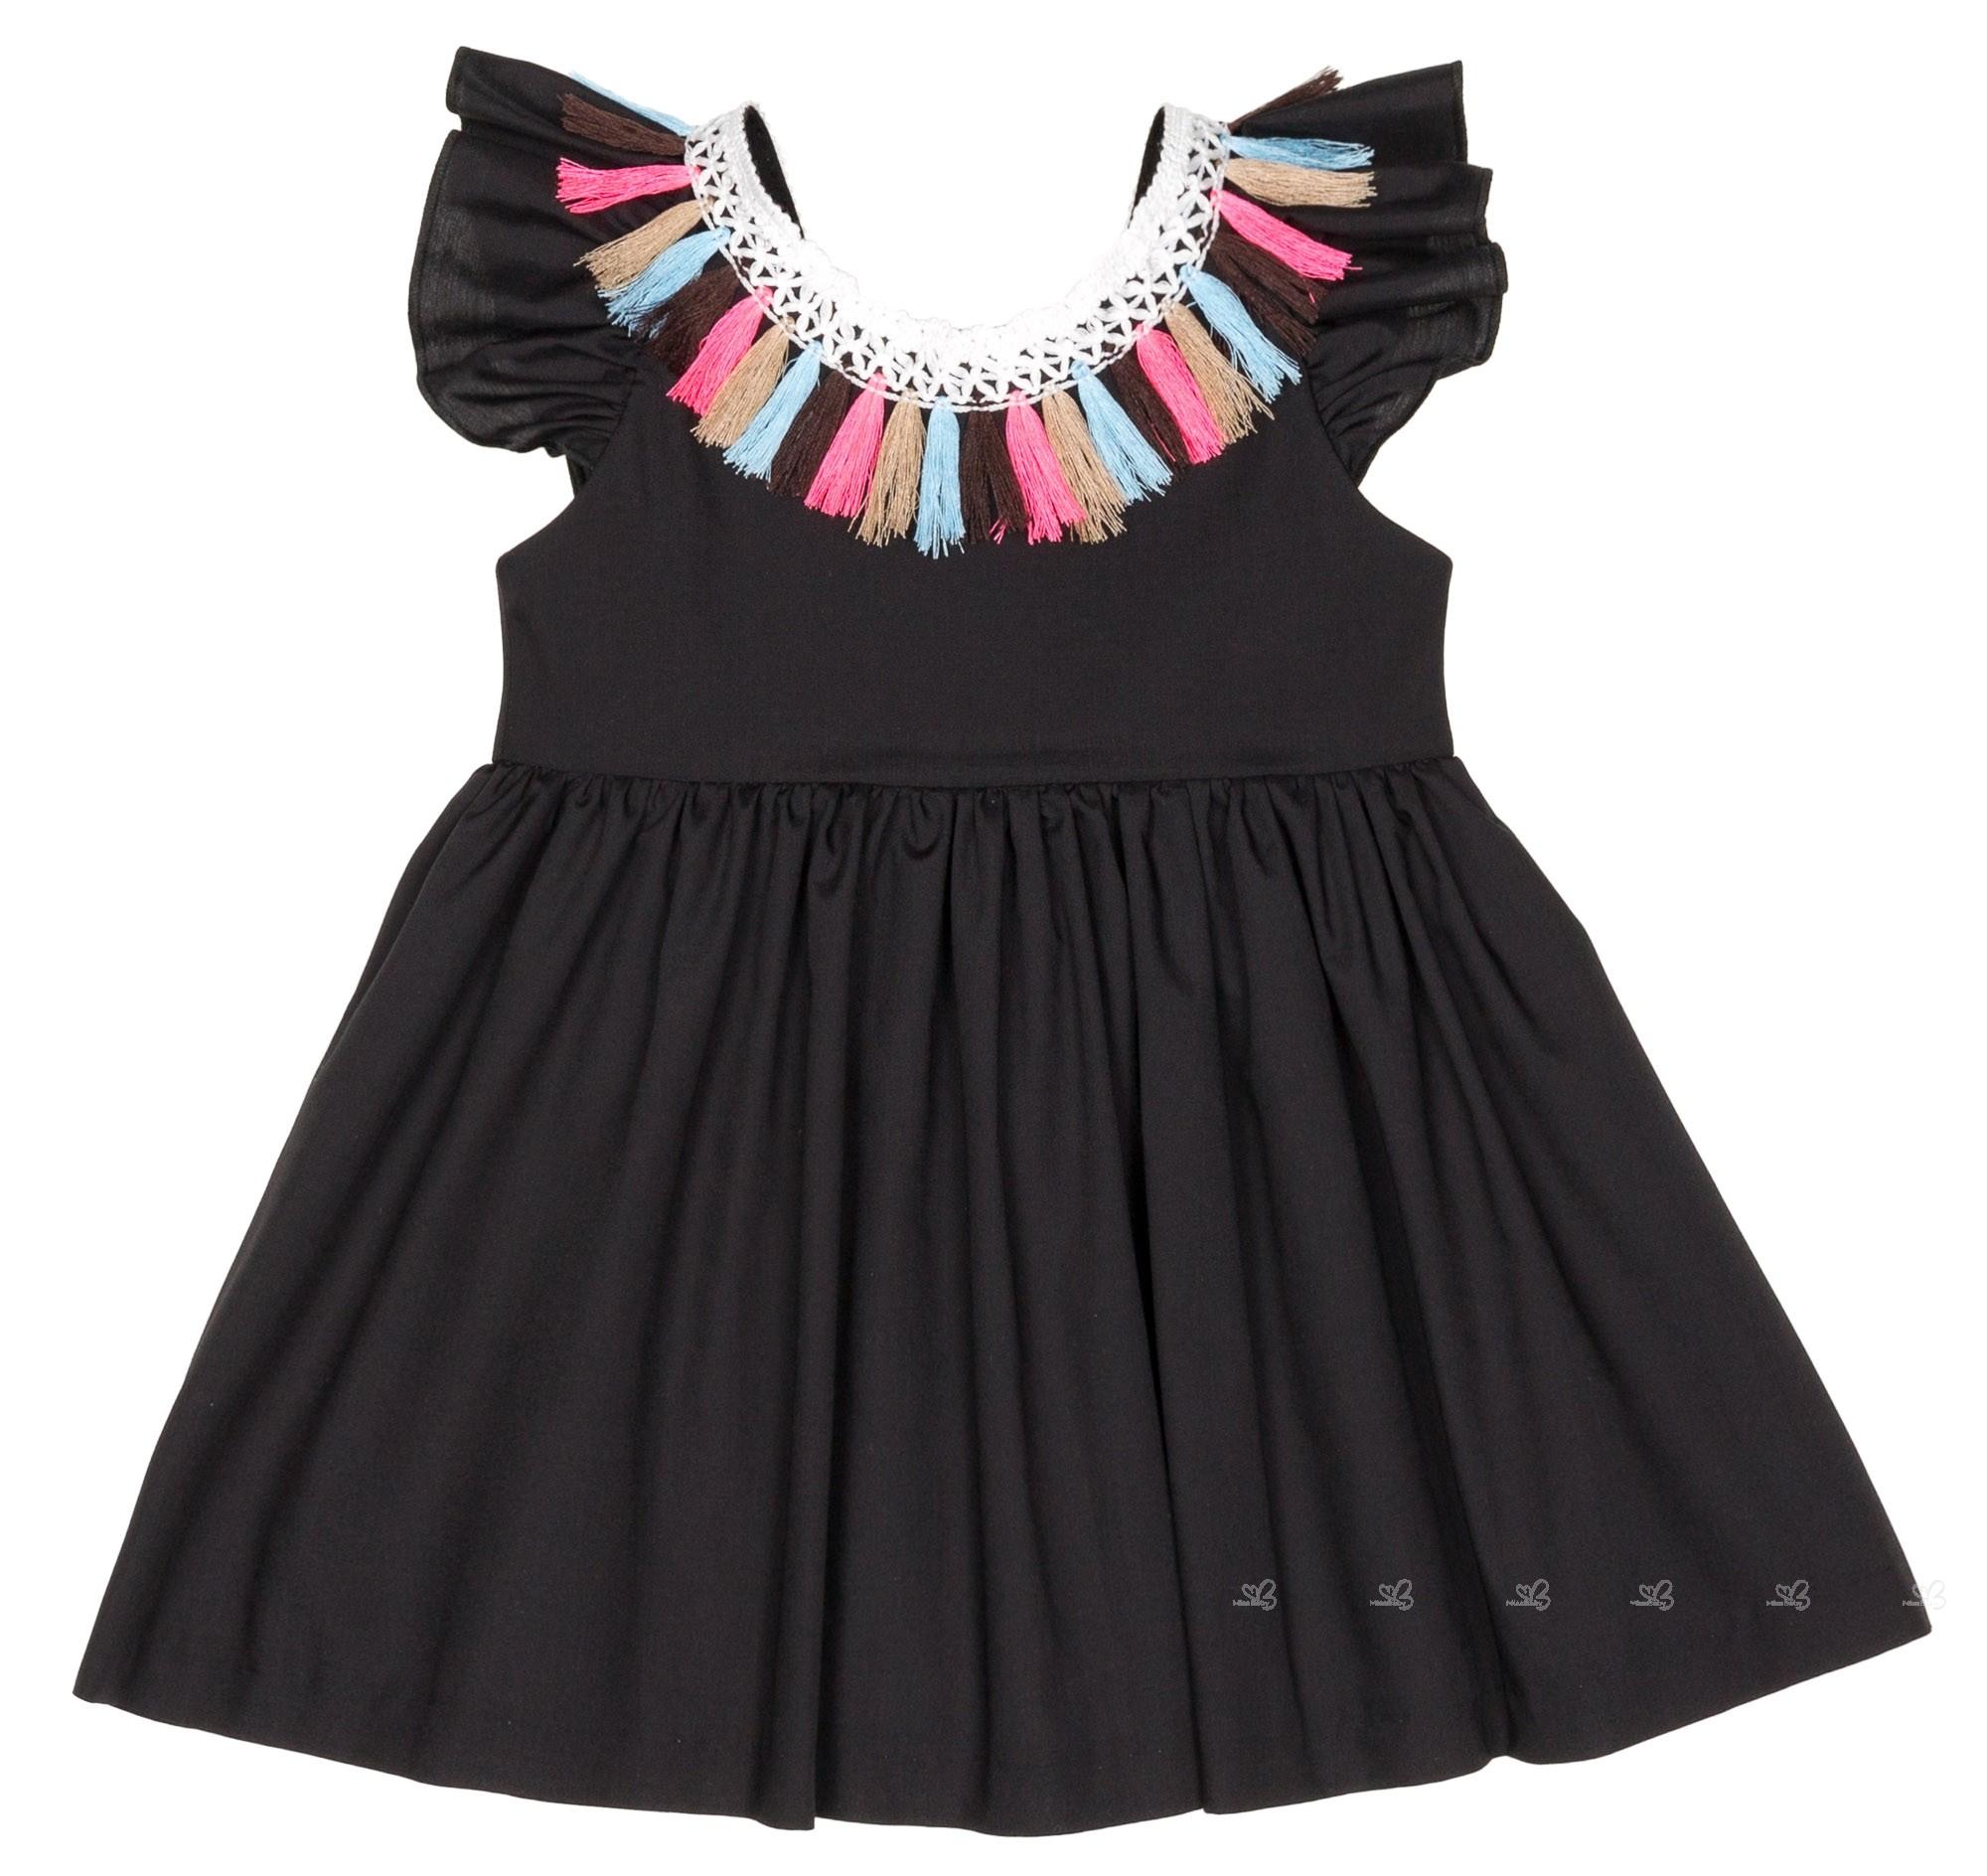 Vestido Niña Volantitos Cuello Crochet Flecos Negro